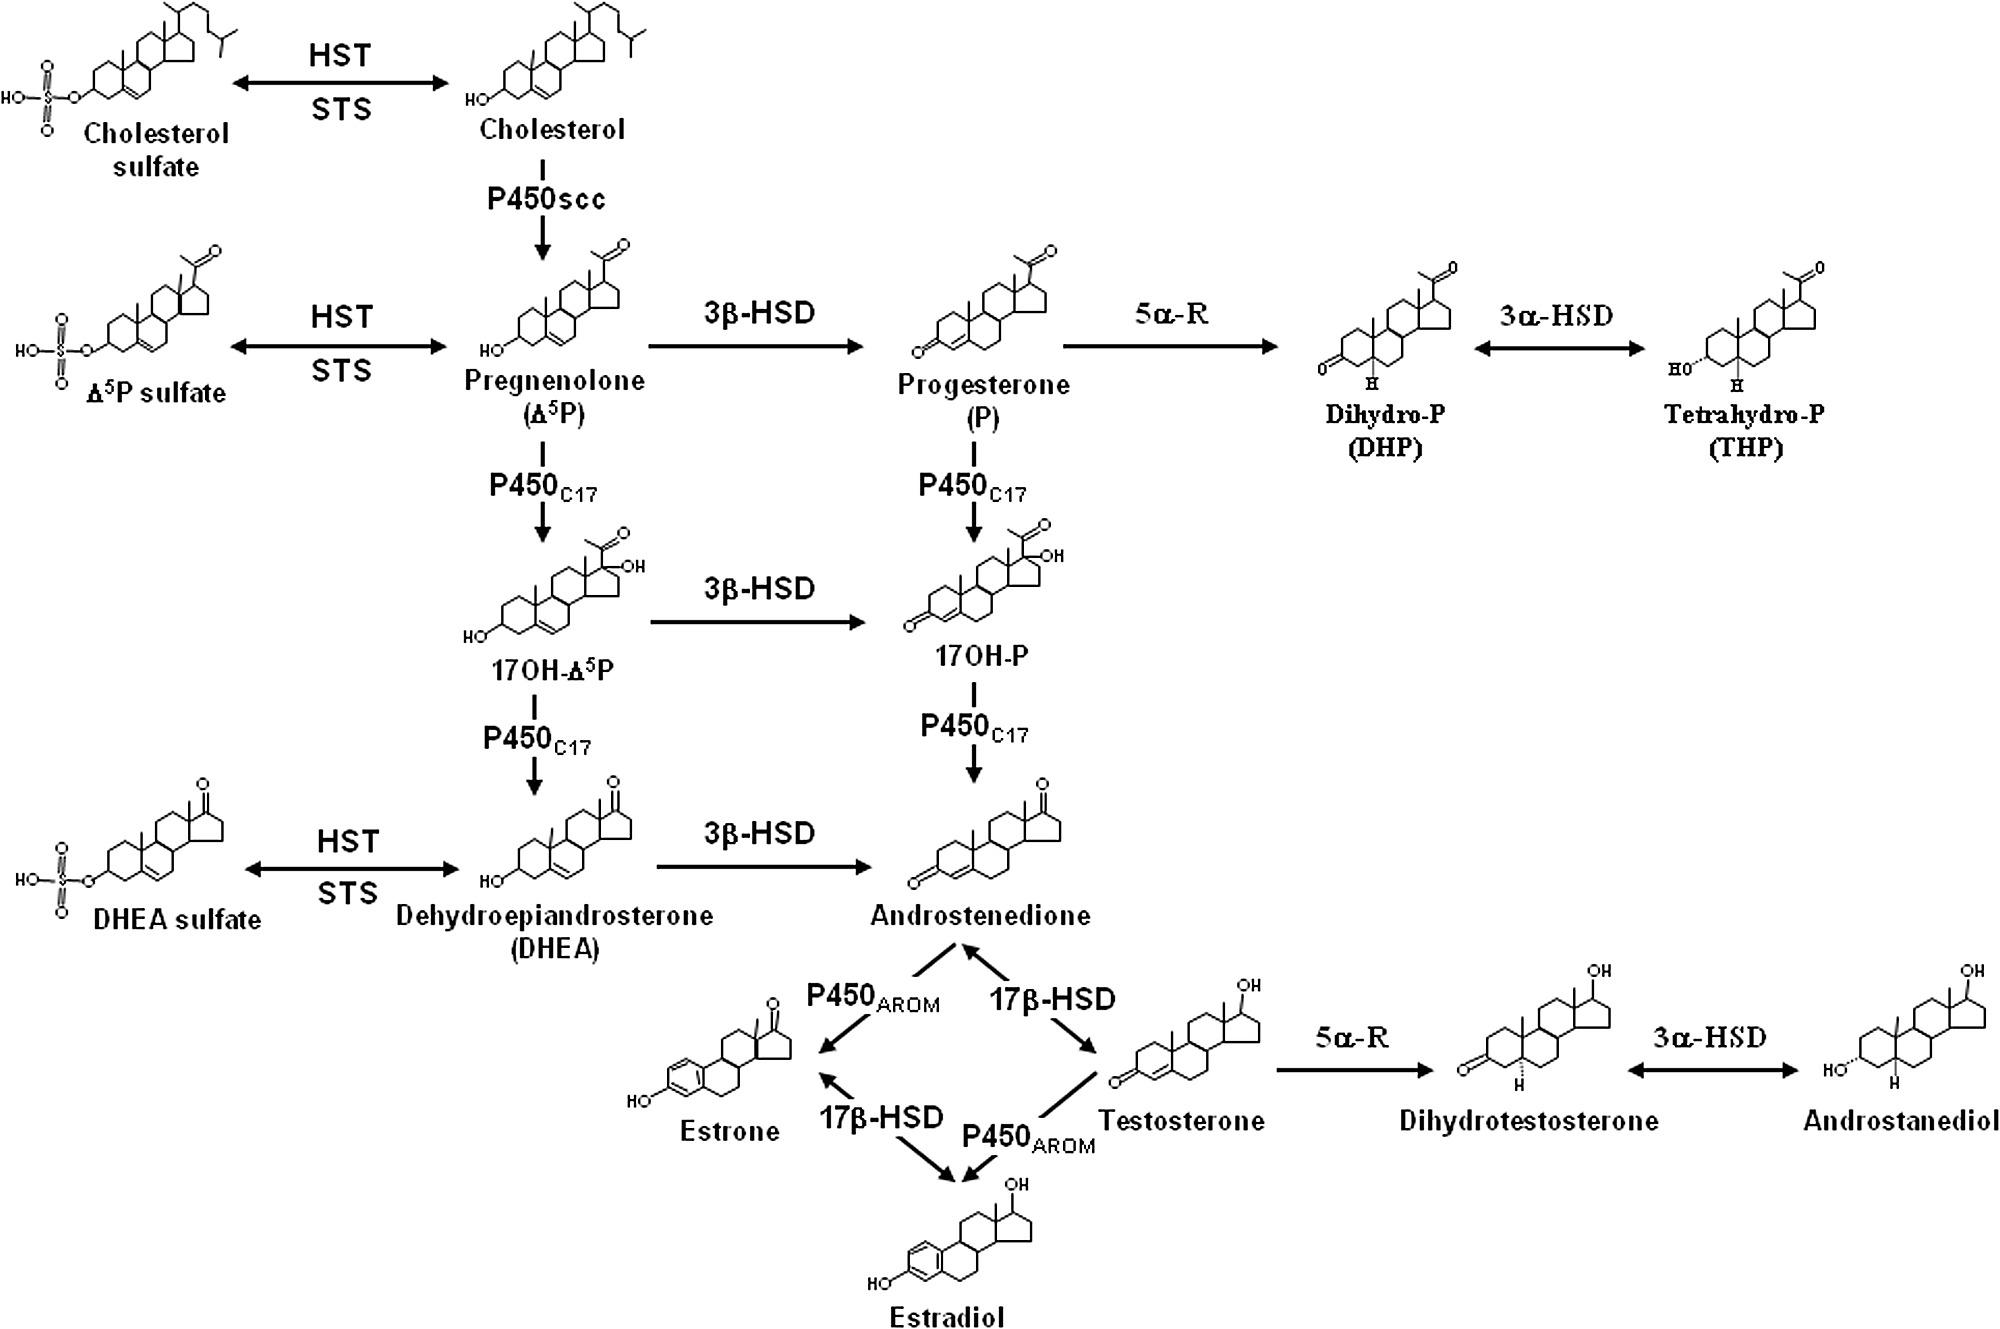 Simplified diagram recapitulating the biosynthetic pathways of simplified diagram recapitulating the biosynthetic pathways of neurosteroids in the brain of vertebrates ccuart Images